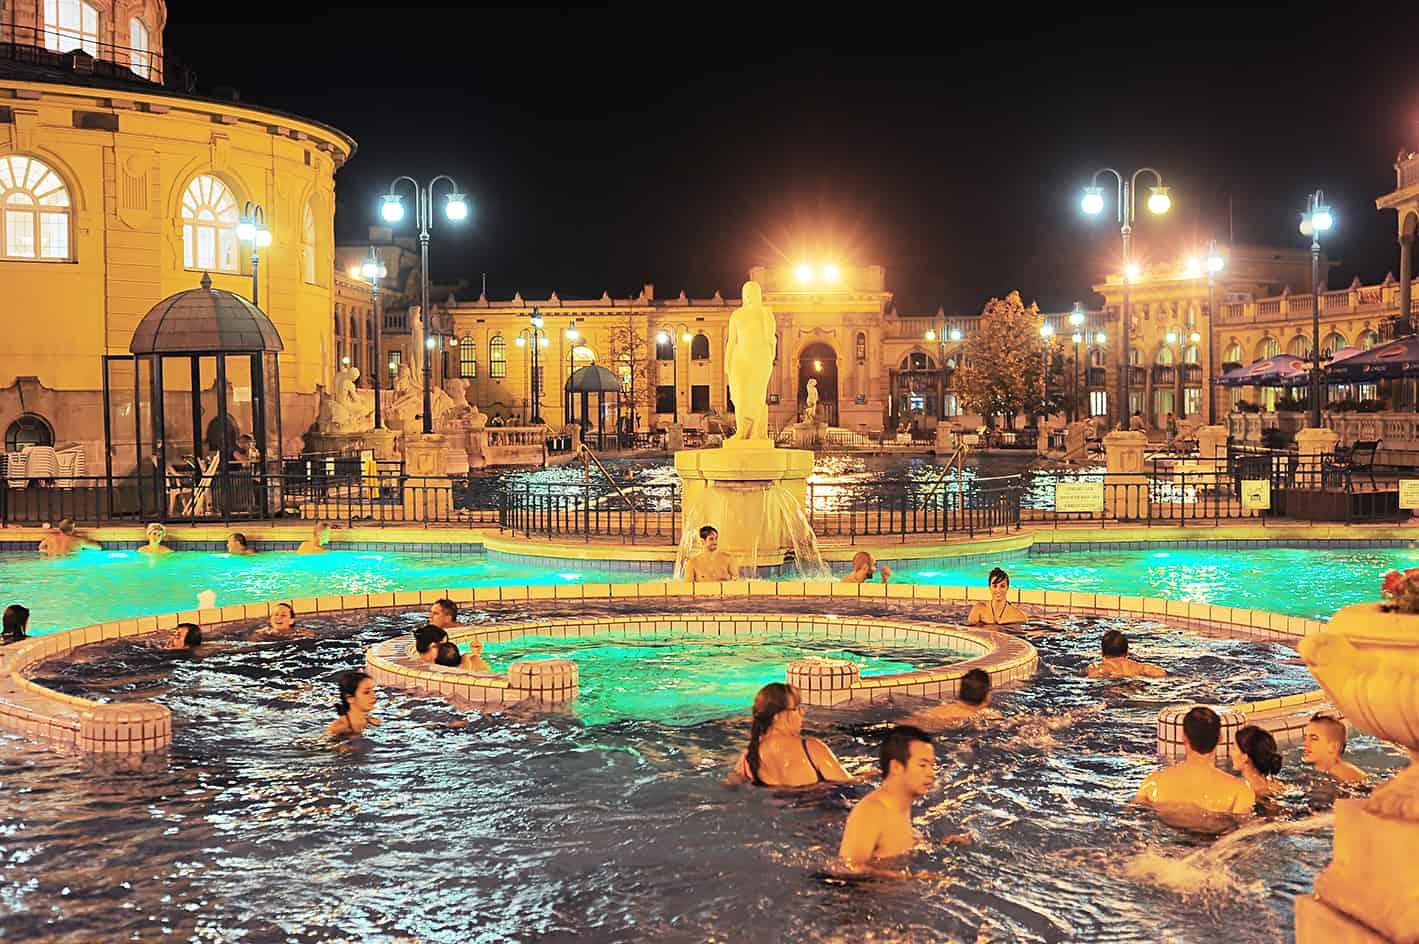 Széchenyi Thermal Bath, Budapeşte, Macaristan